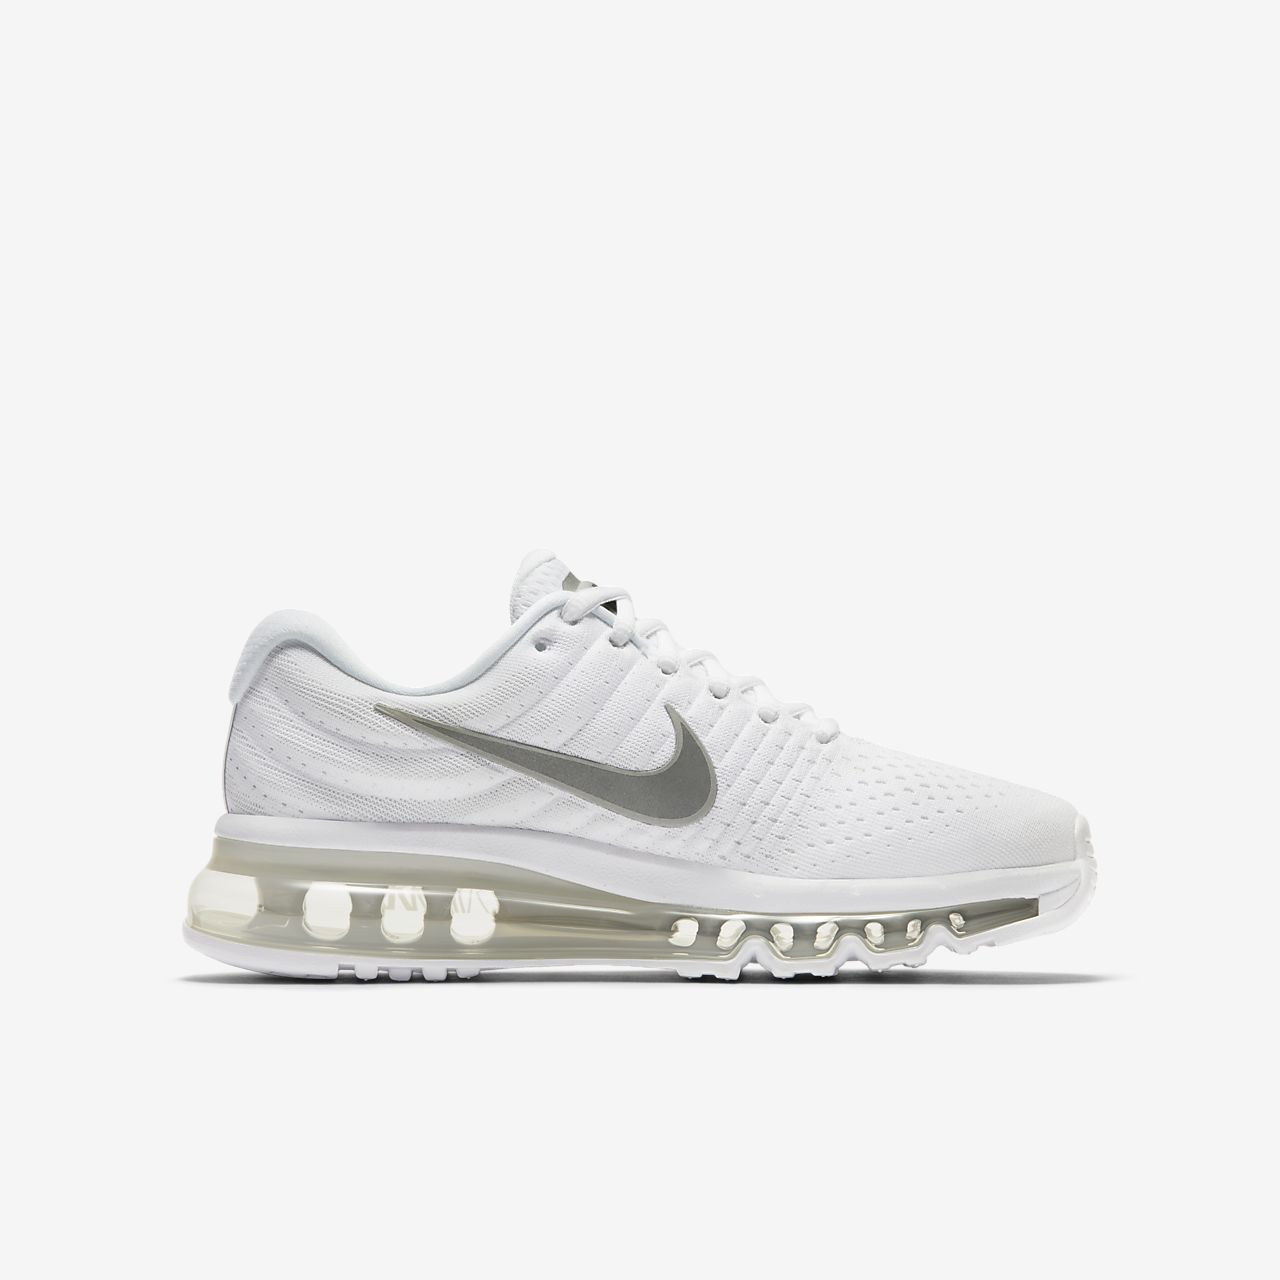 separation shoes 4c692 5daab ... Scarpa Nike Air Max 2017 - Ragazzi